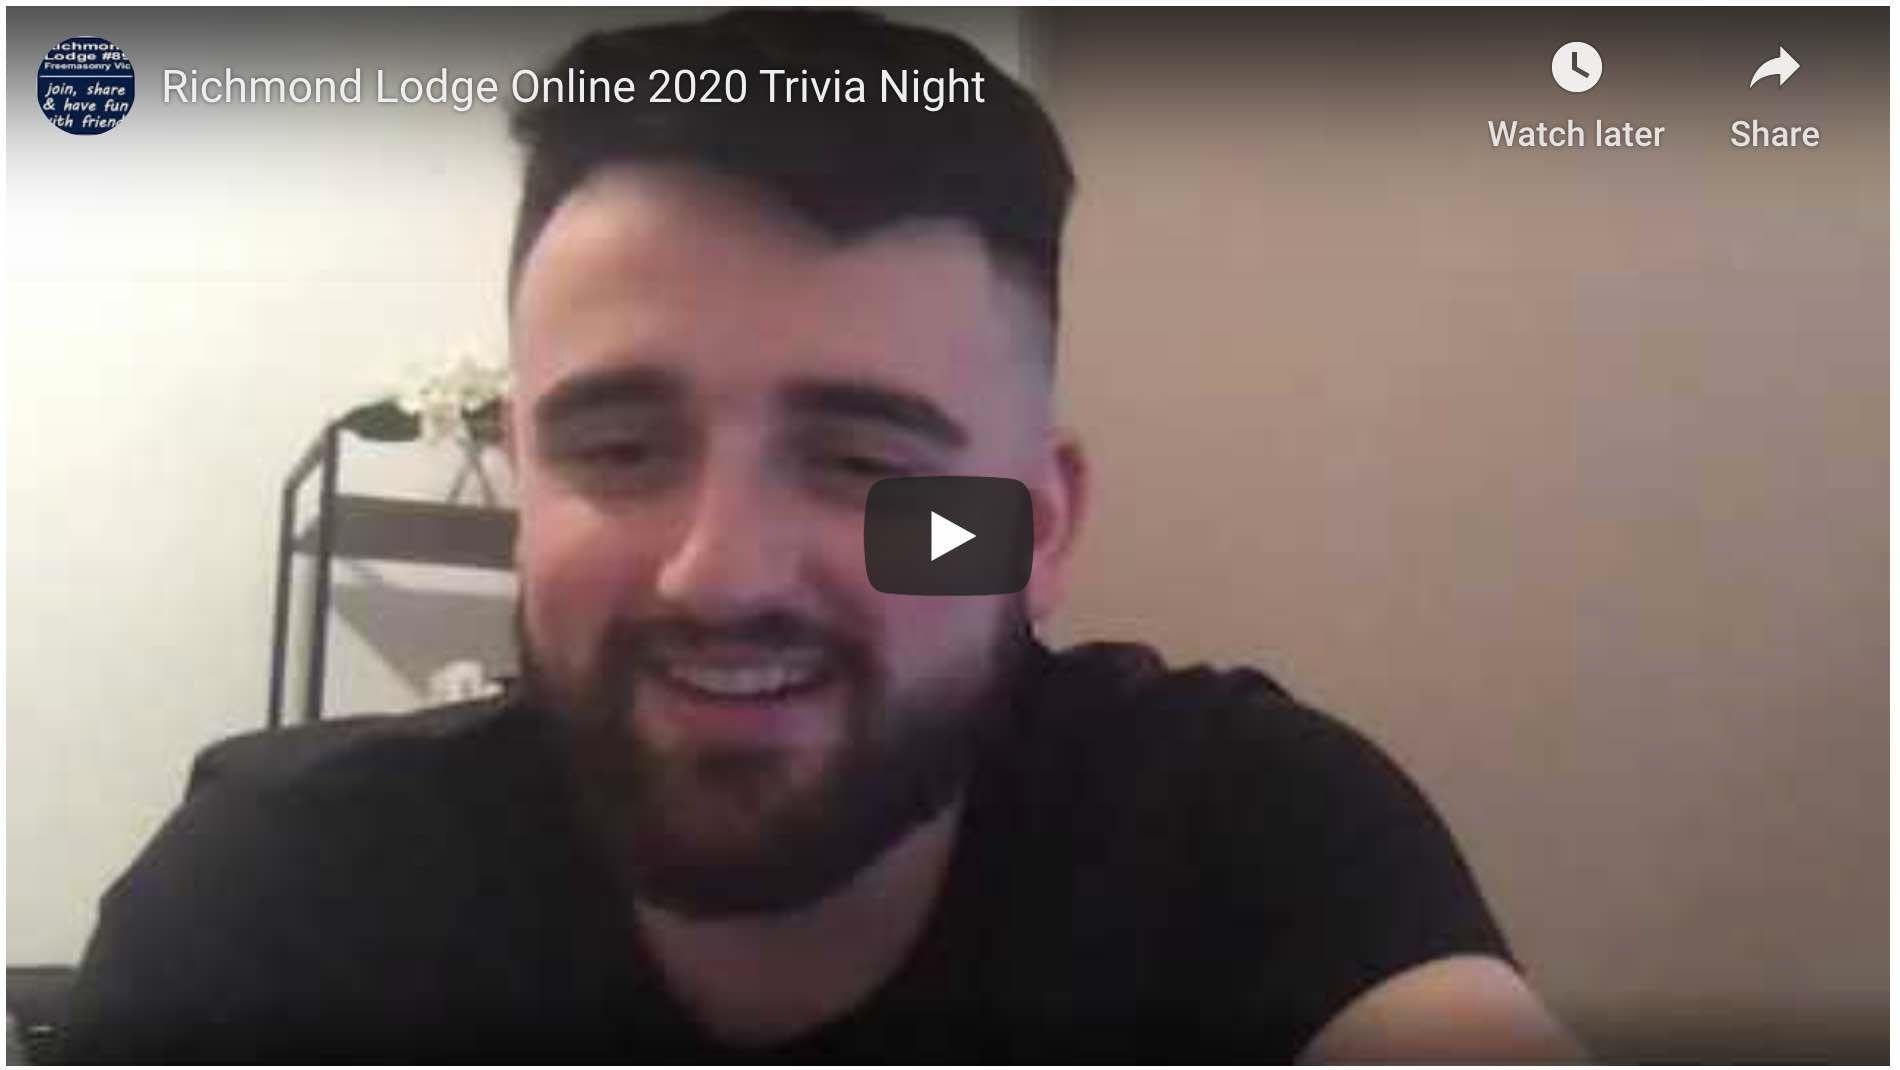 Richmond Lodge Online 2020 Trivia Night